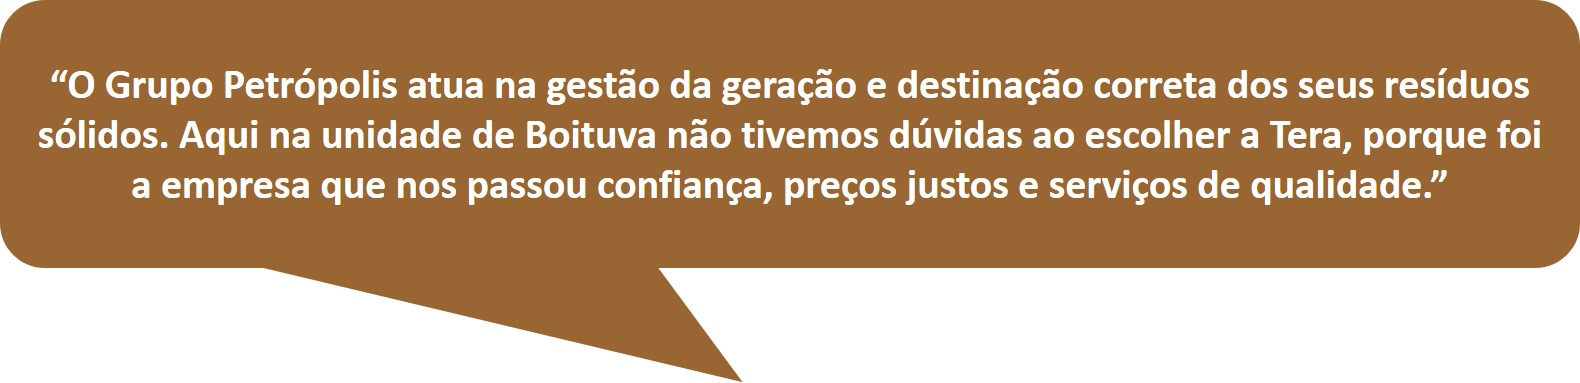 Depoimento_case_Petrópolis